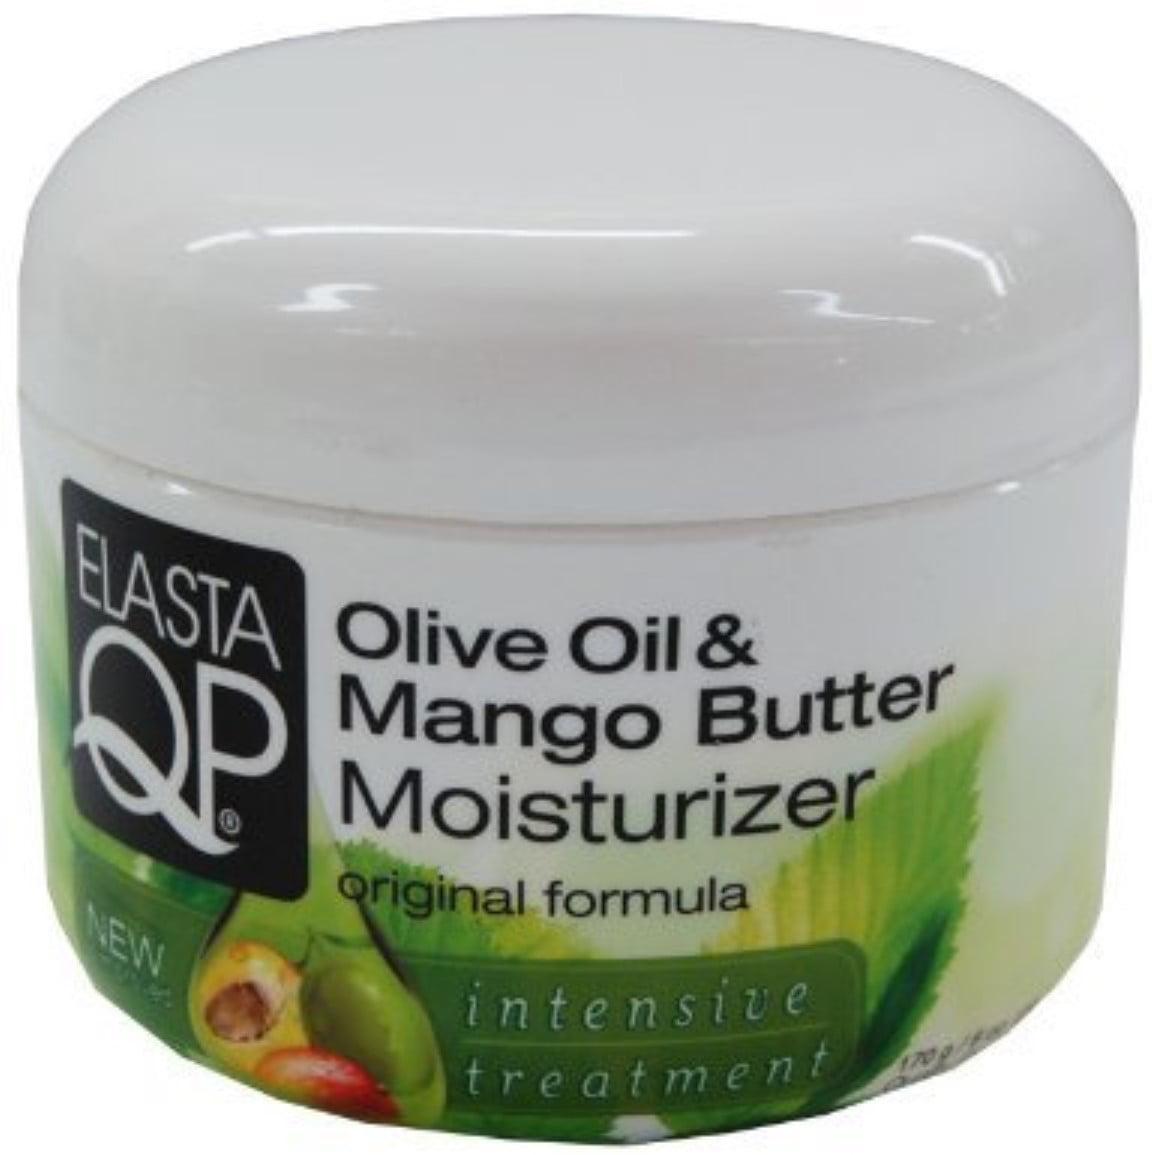 Elasta QP Olive Oil & Mango Butter Hair Moisturizer, 8.25 oz